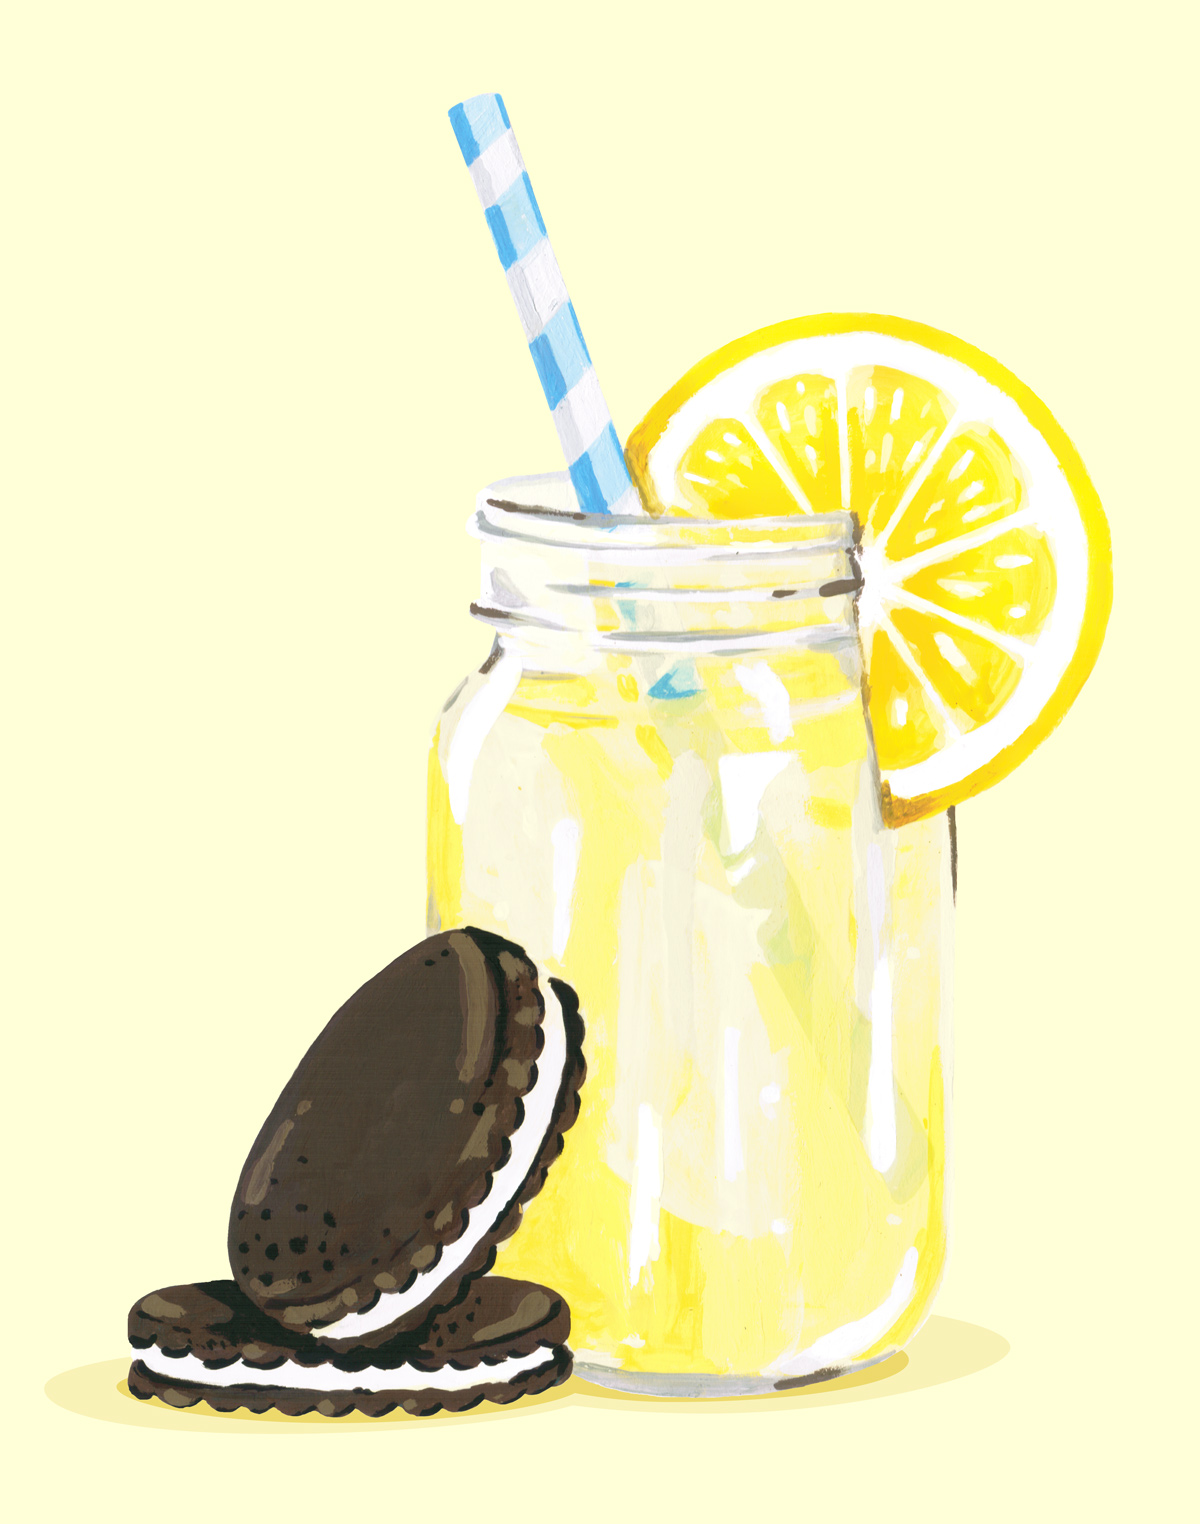 AndreaGonzalez_Themes_Food&Drink_Web.jpg